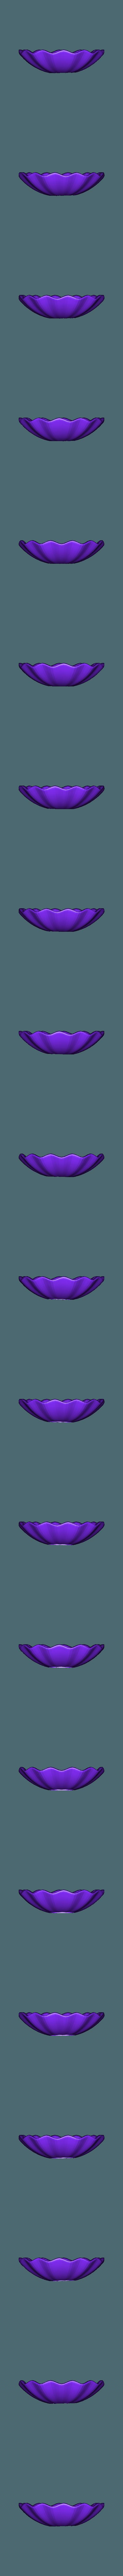 Flower arm_fixed.stl Download free STL file 6 Armed chandelier • 3D printer design, Gunnarf1986